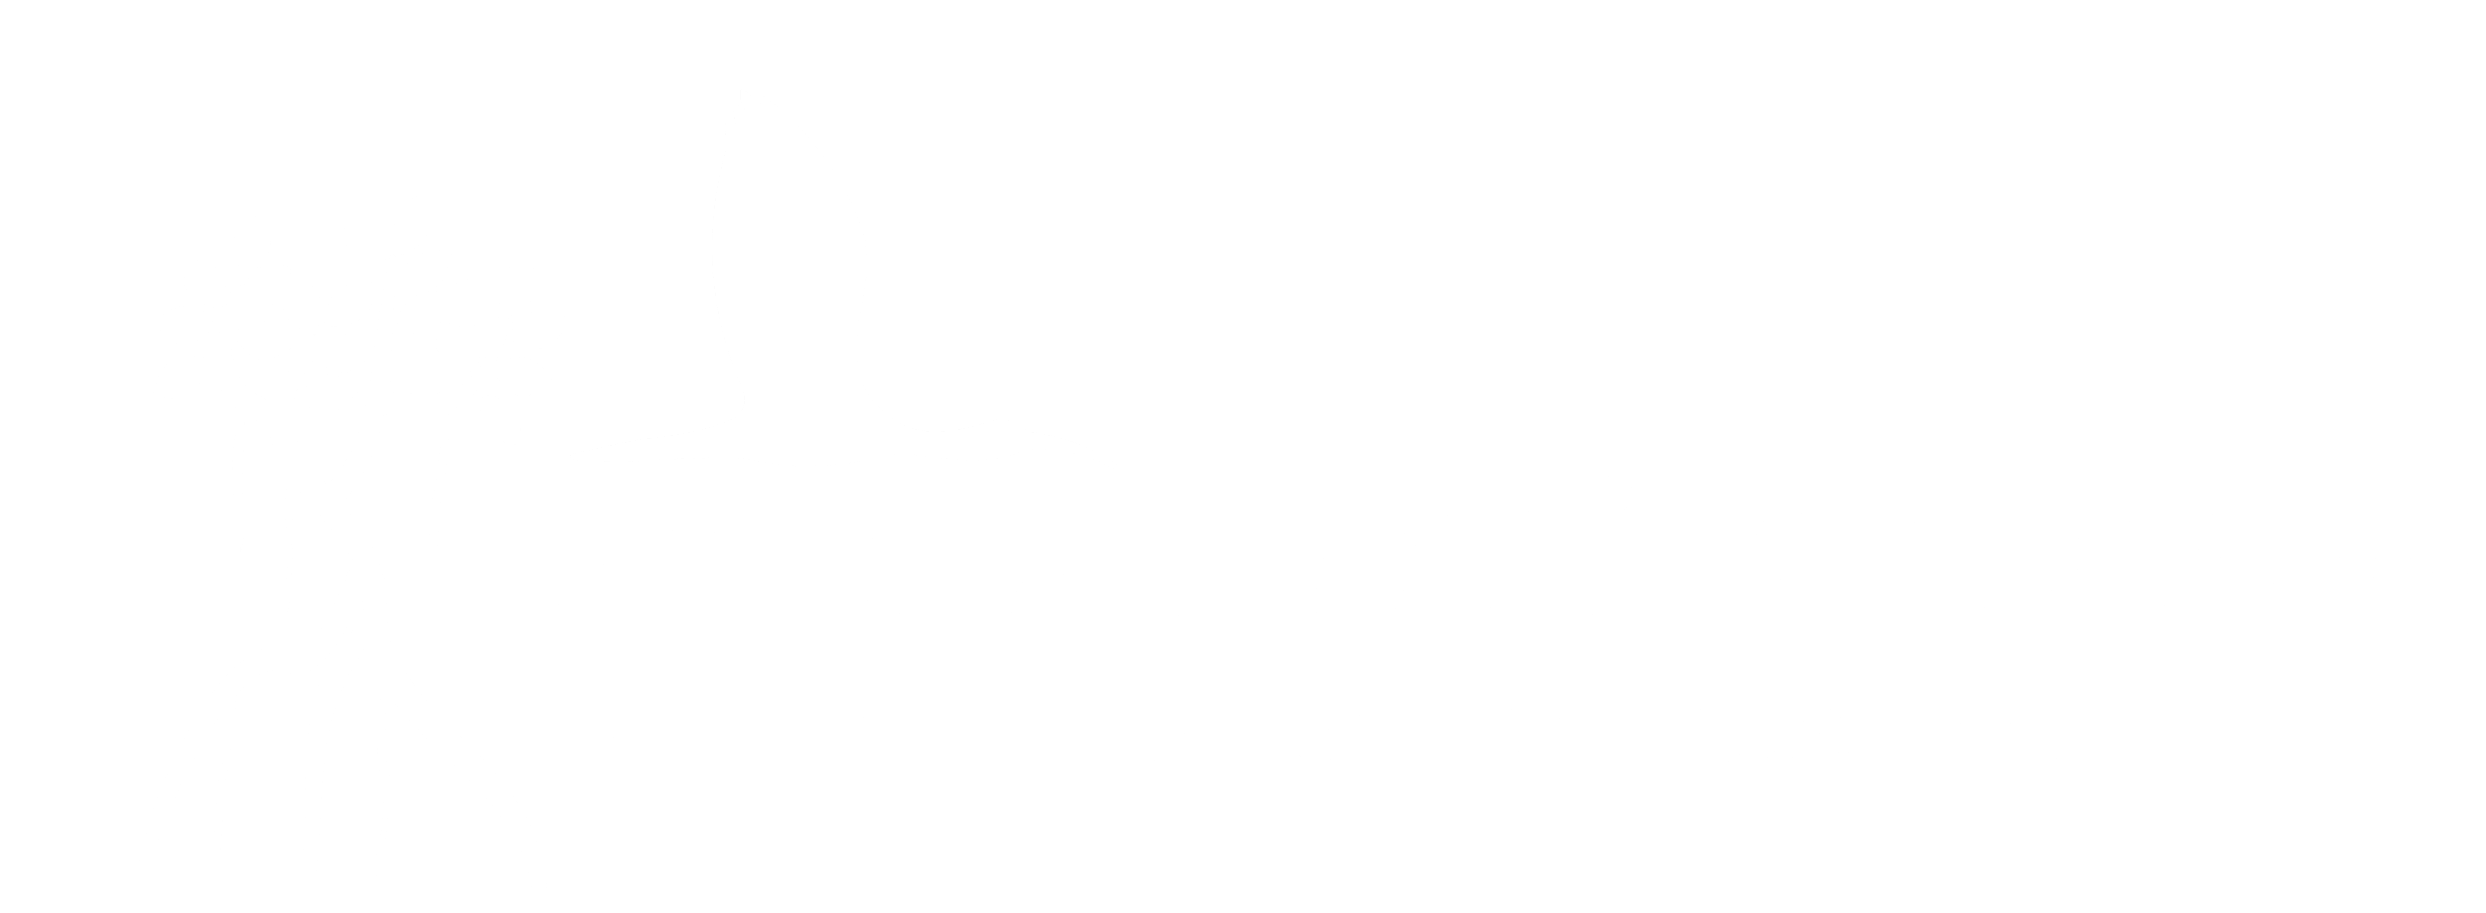 TampaBayEcoCharters.com